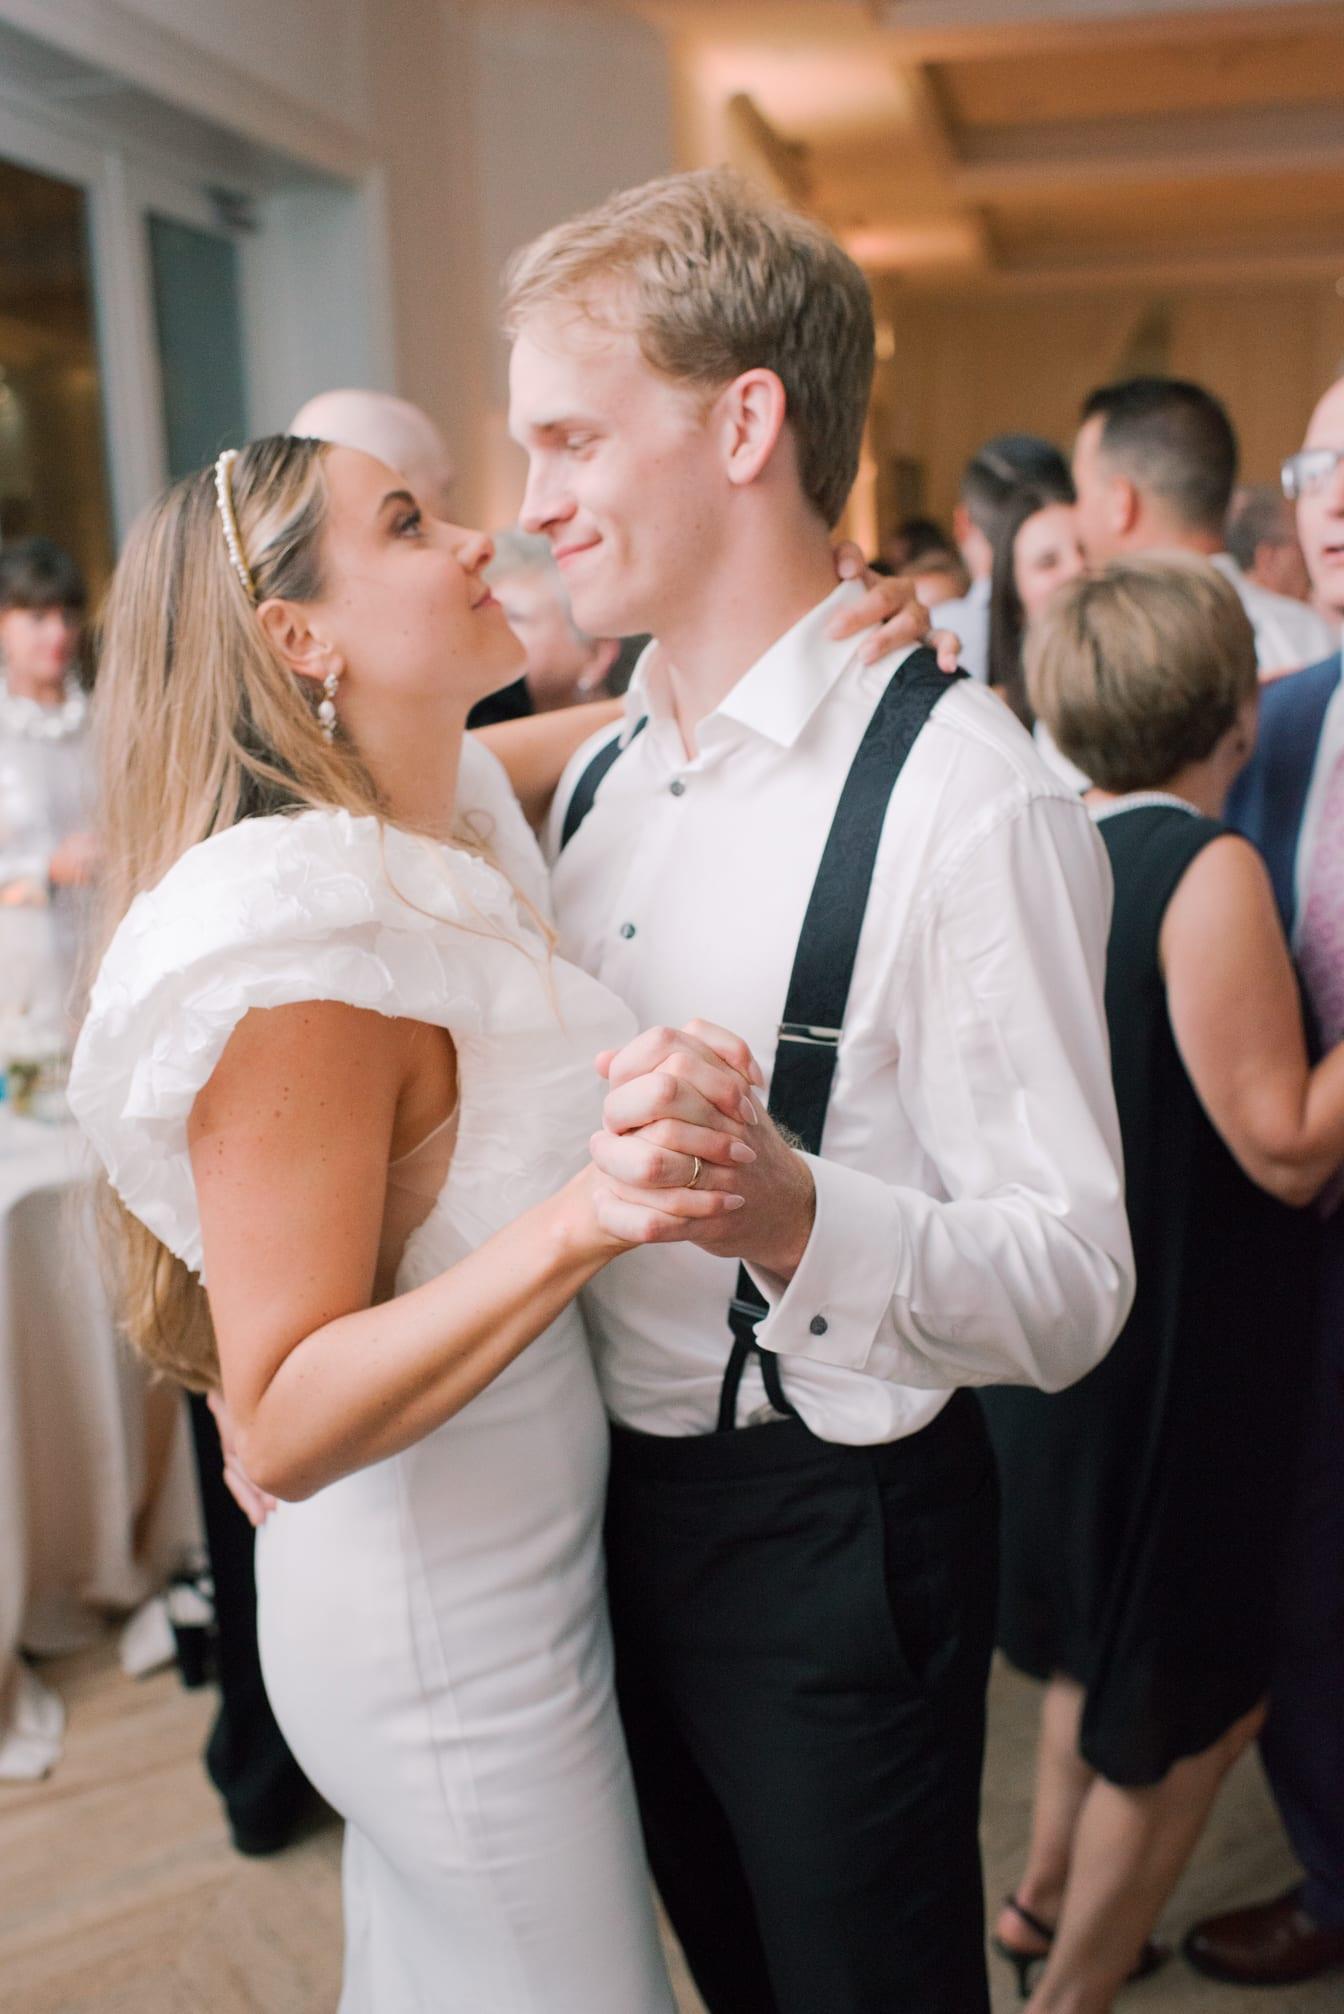 Chicago Wedding Photographer for Chicago Illuminating Company